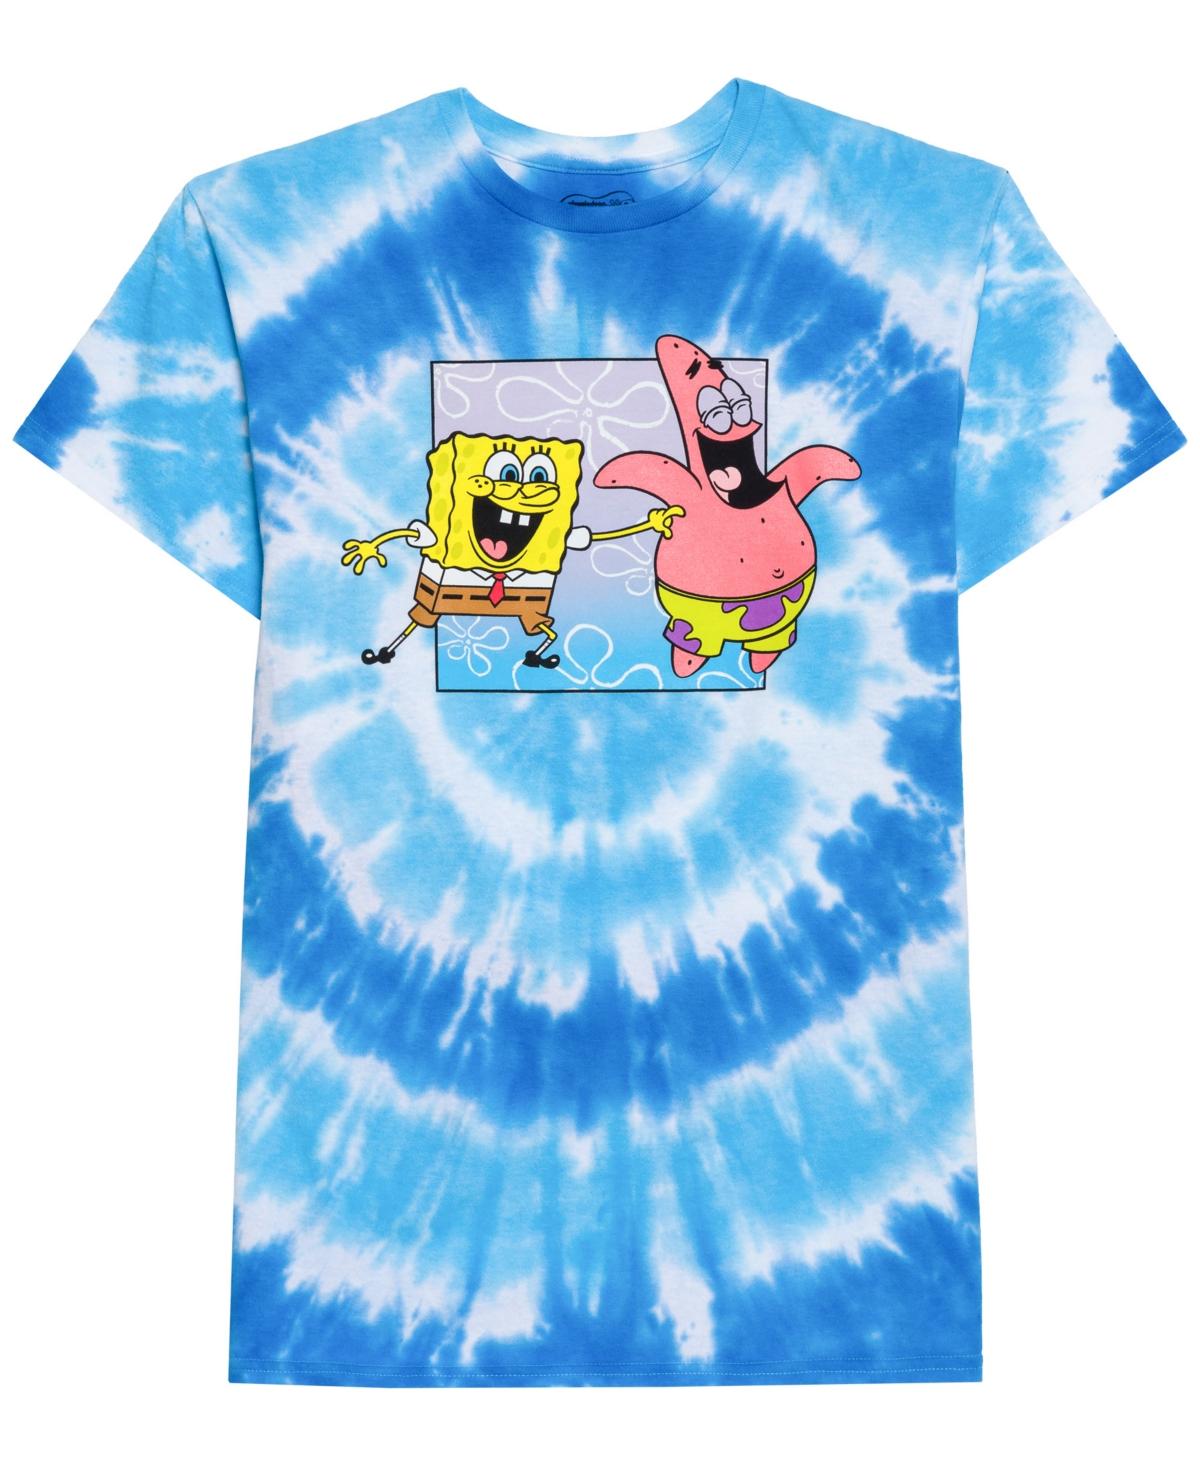 Men's Boxed Spongebob Graphic T-Shirt